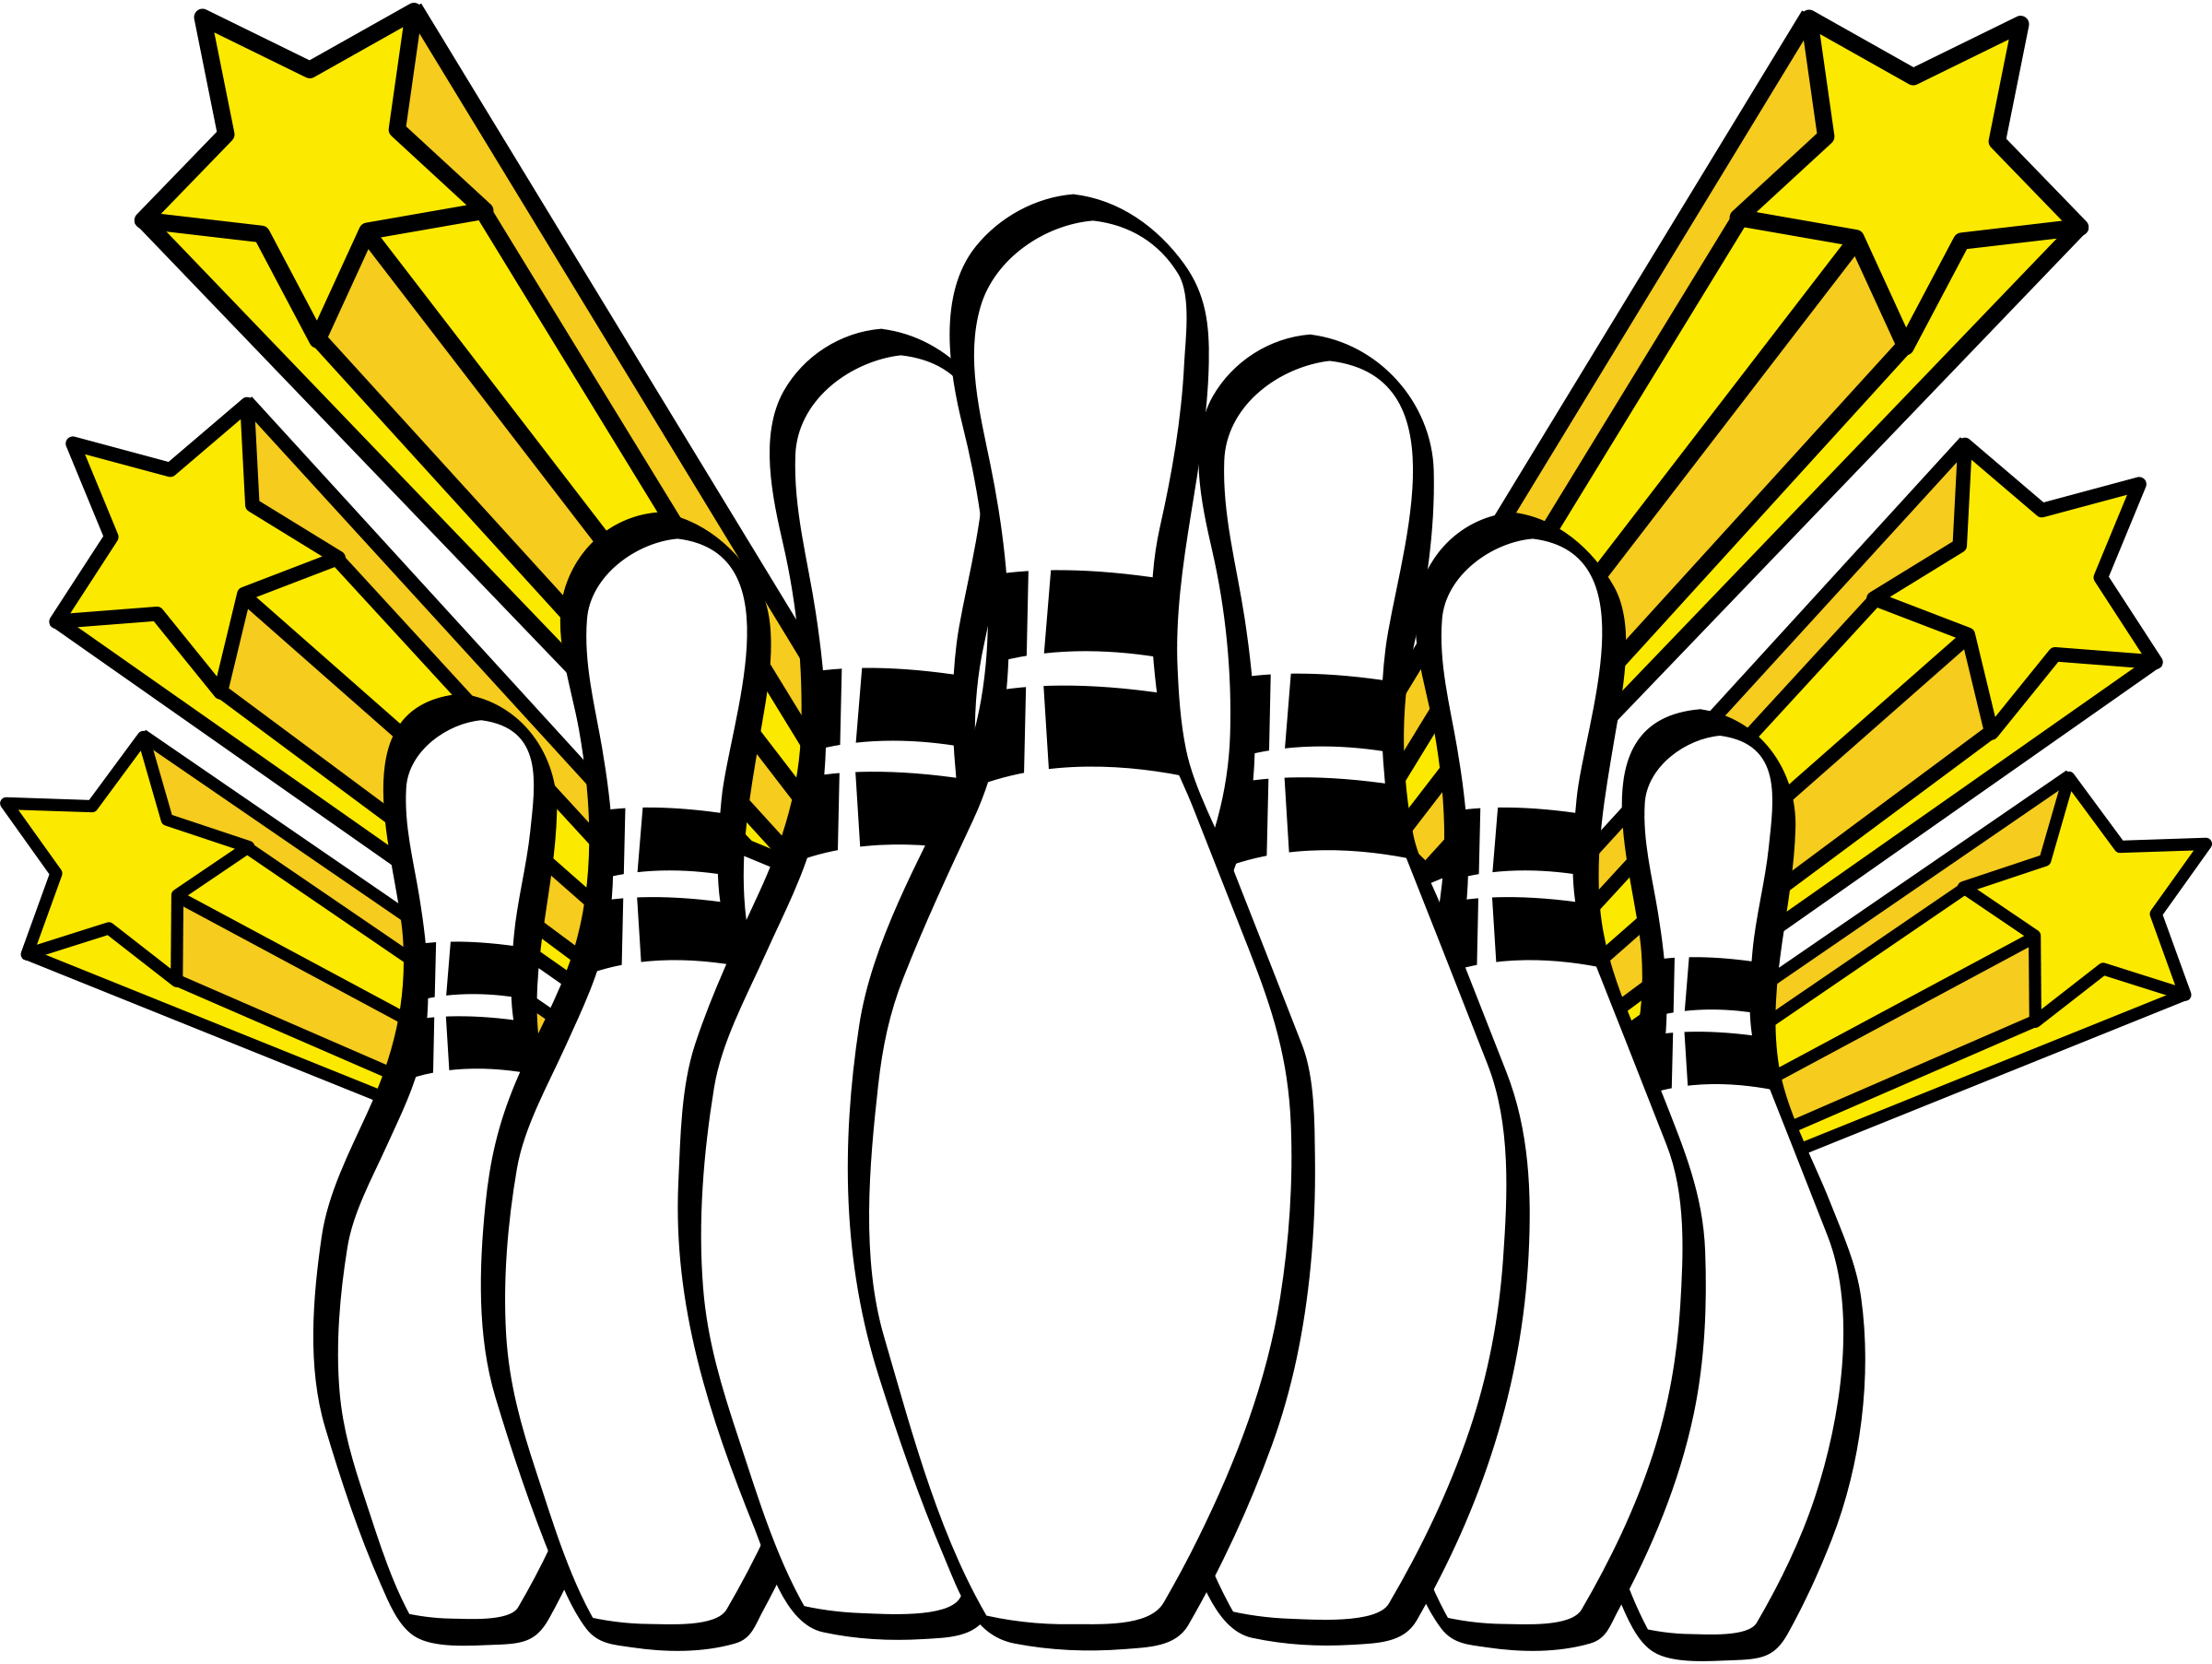 2400x1805 Bowling Pins Clip Art